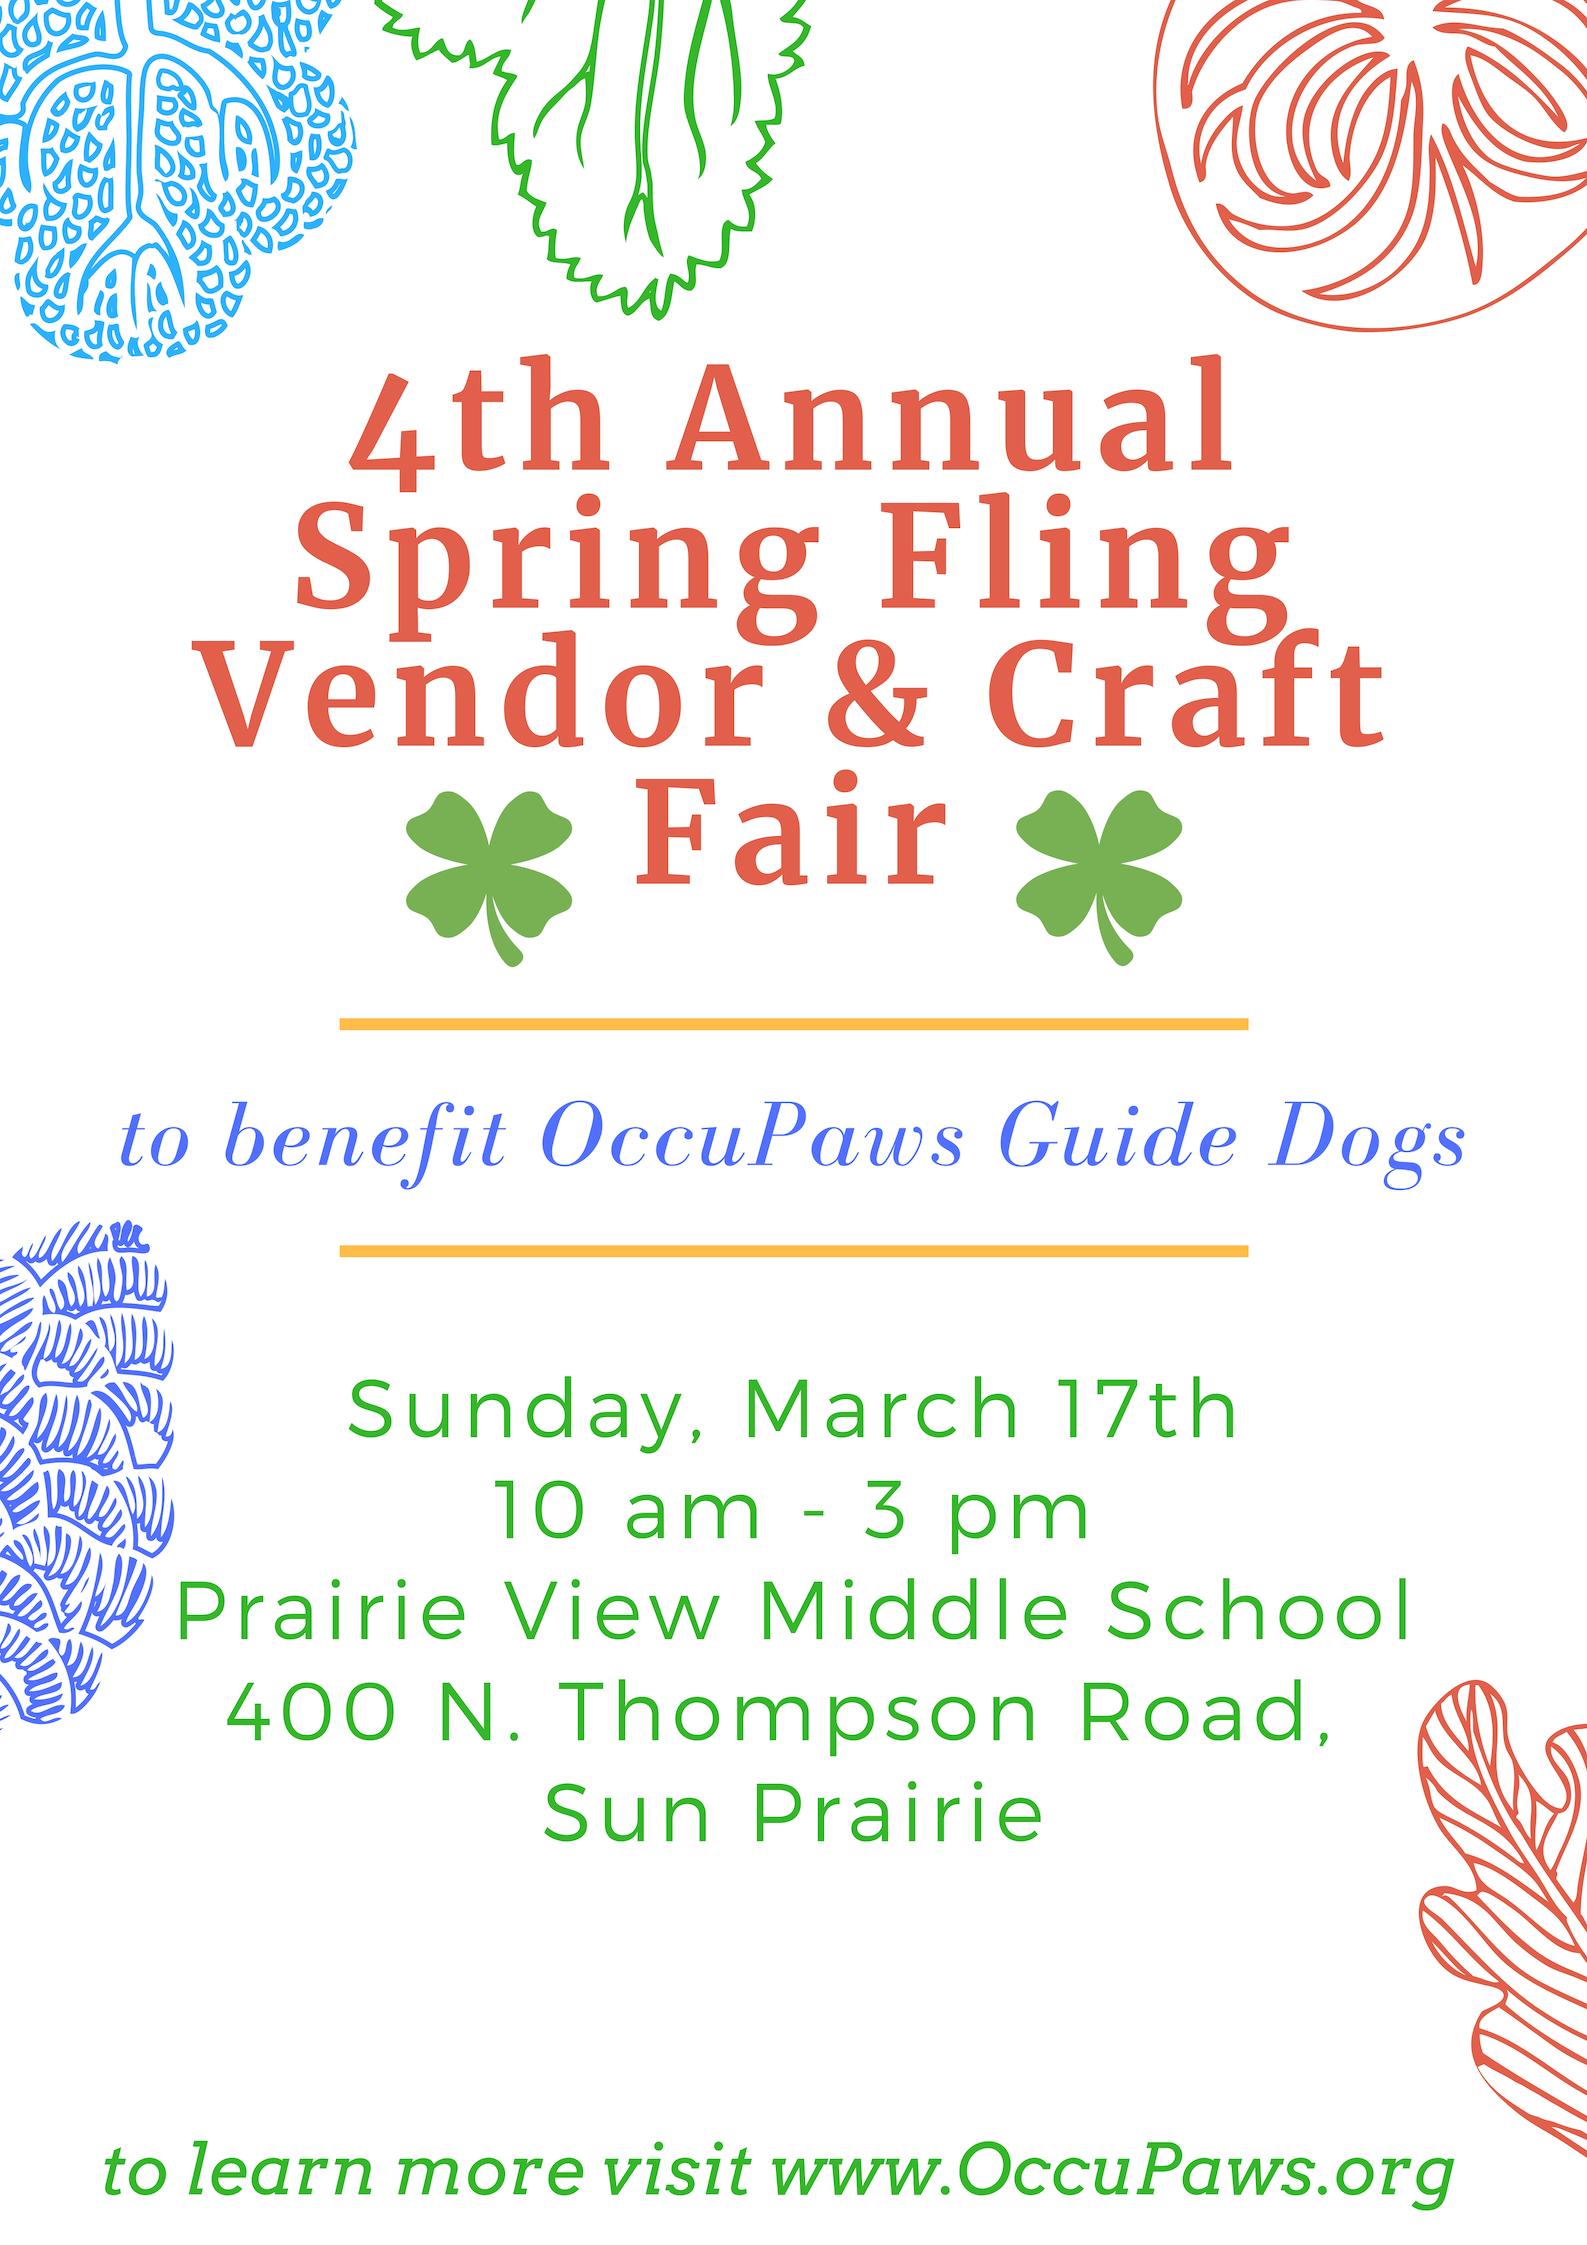 4Th Annual Spring Fling Vendor & Craft Fair For Occupaws With Regard To Sun Prairie Calendar School District